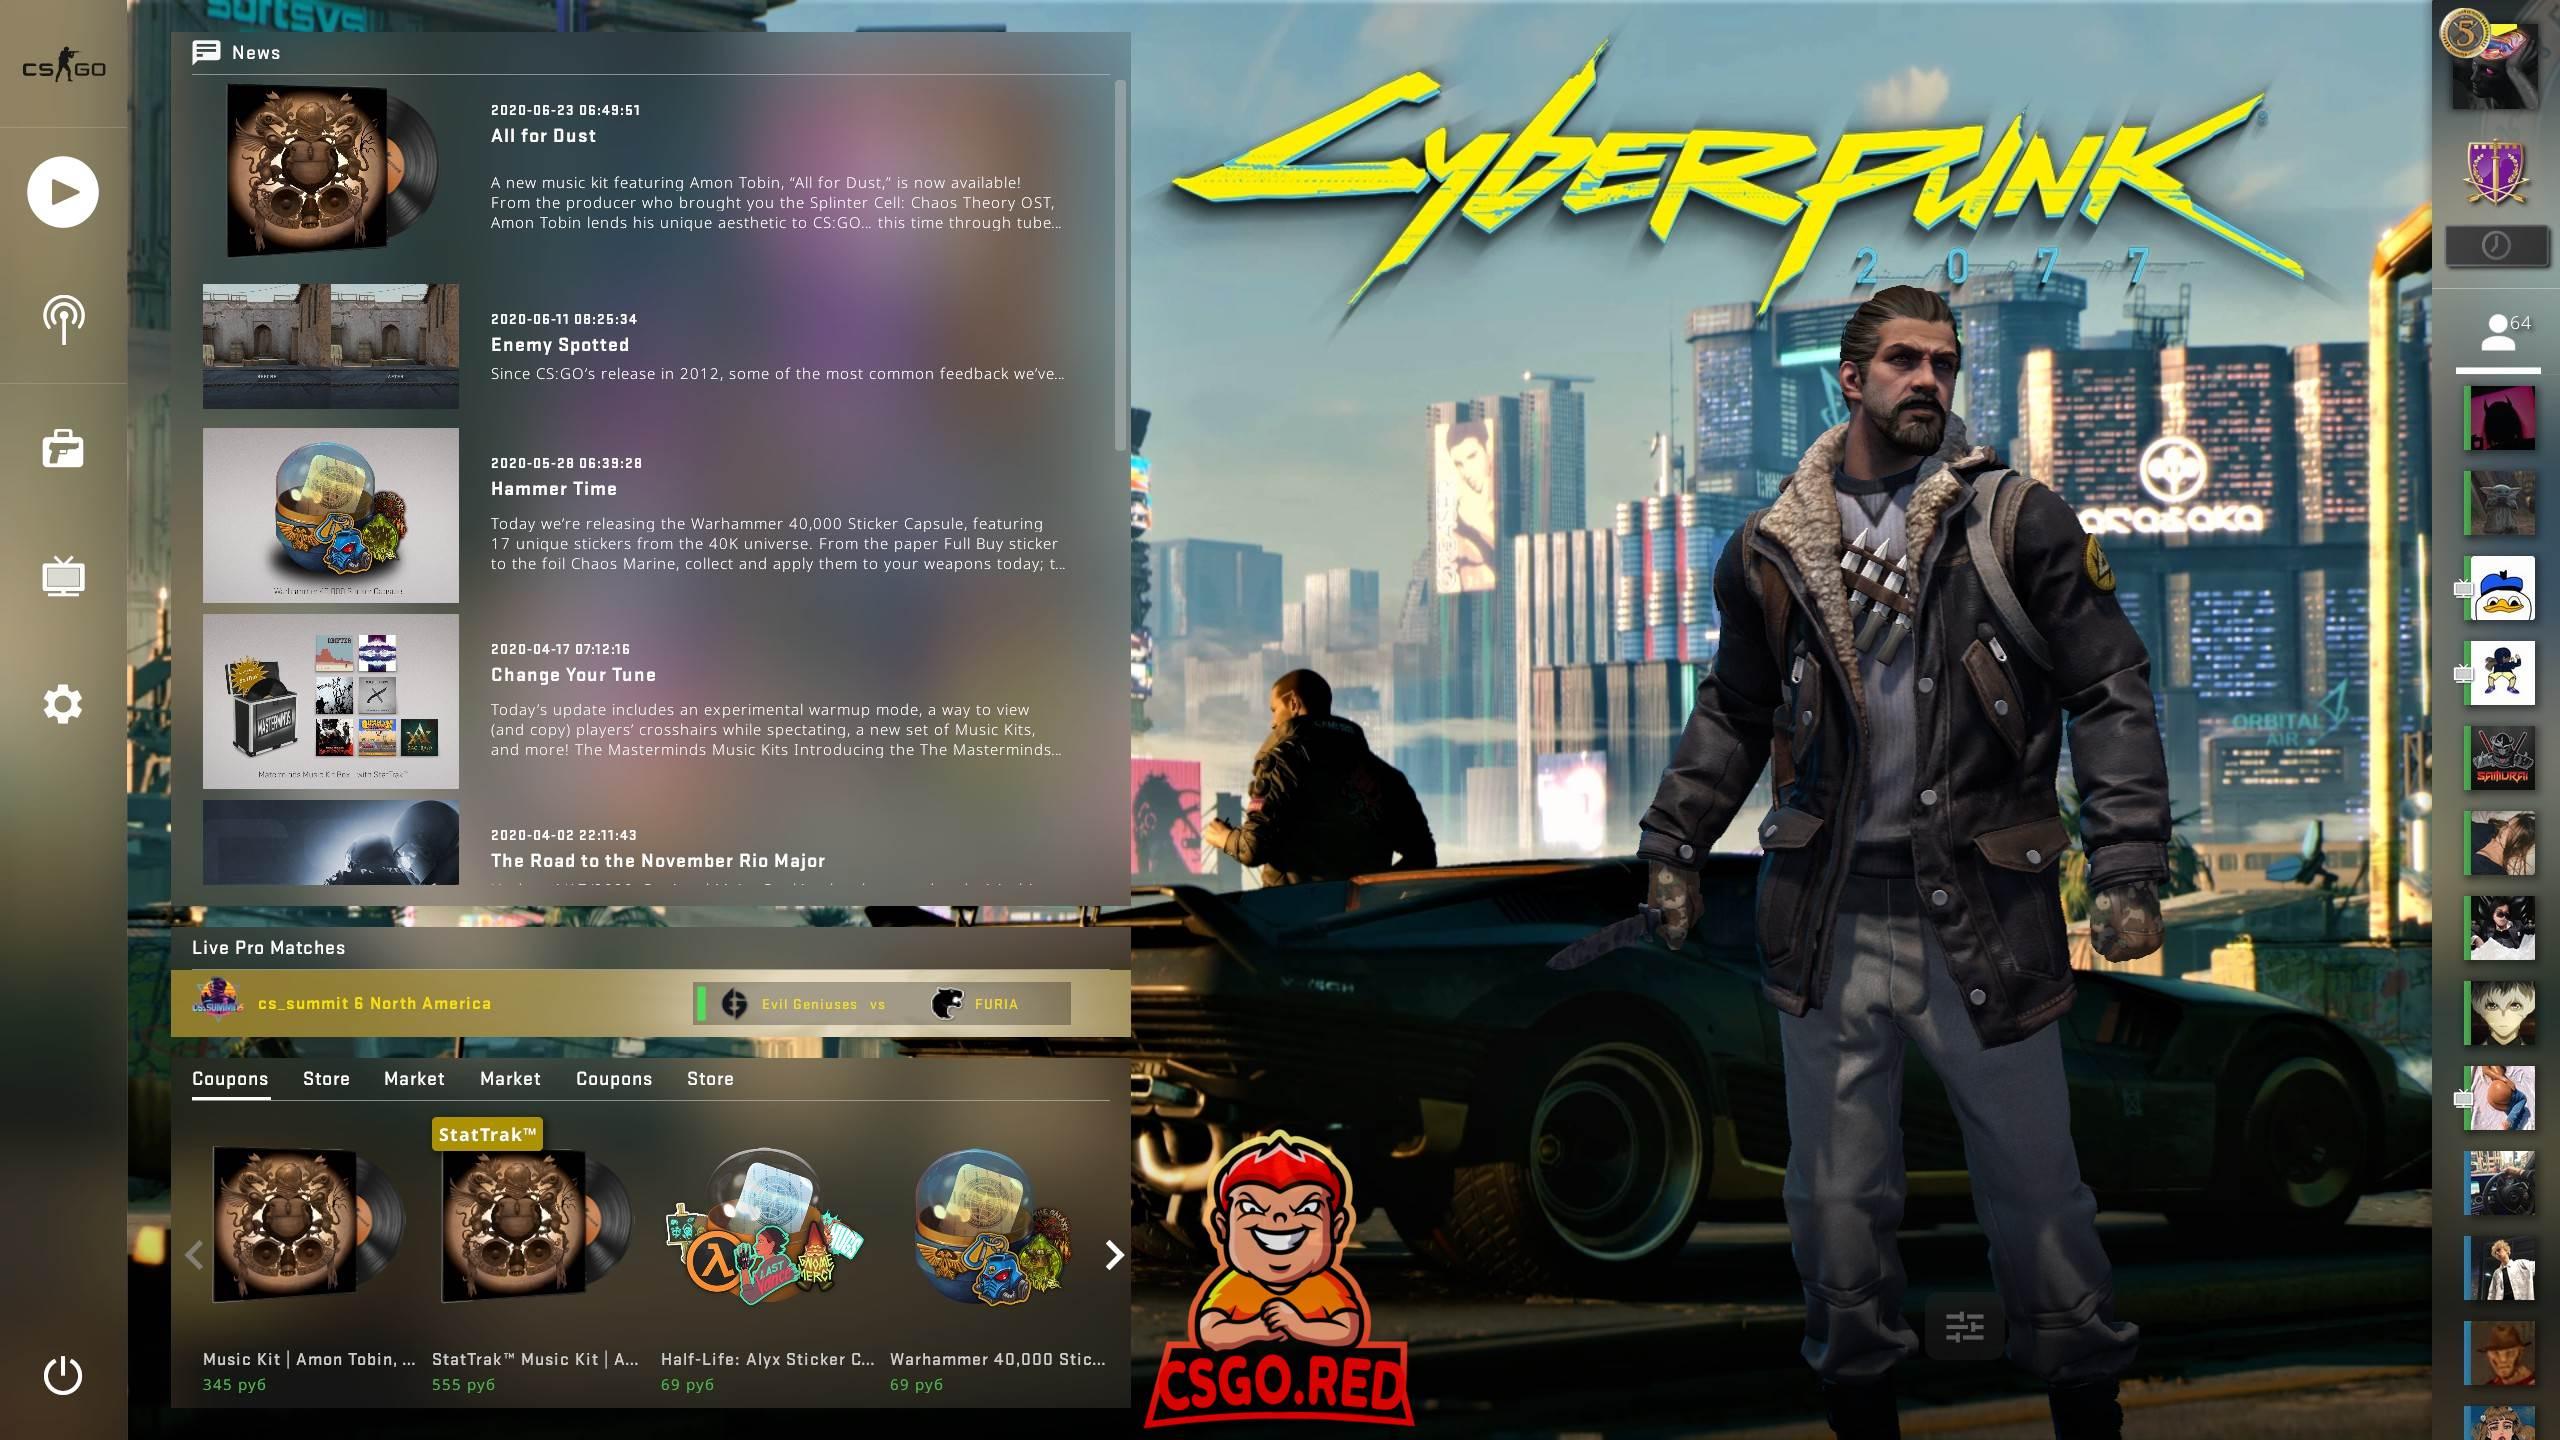 Cyberpunk 2077 city & car panorama UI background